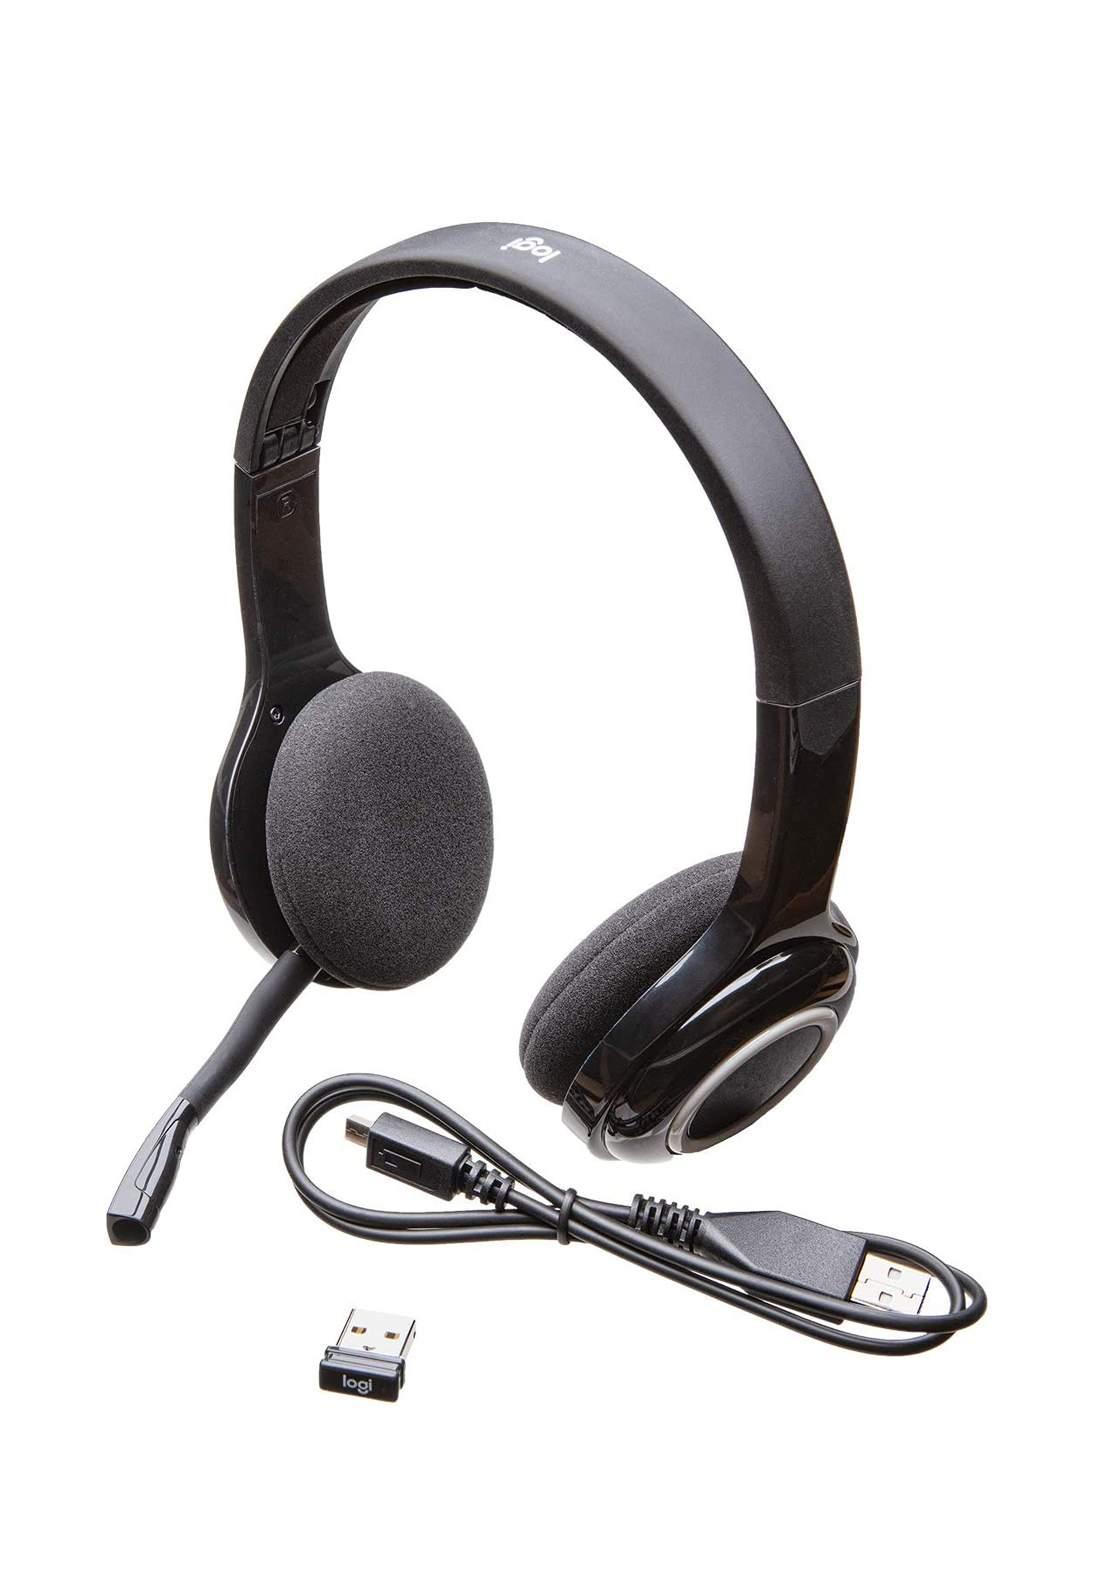 Logitech H600  Wireless Headset - Black سماعة لا سلكية